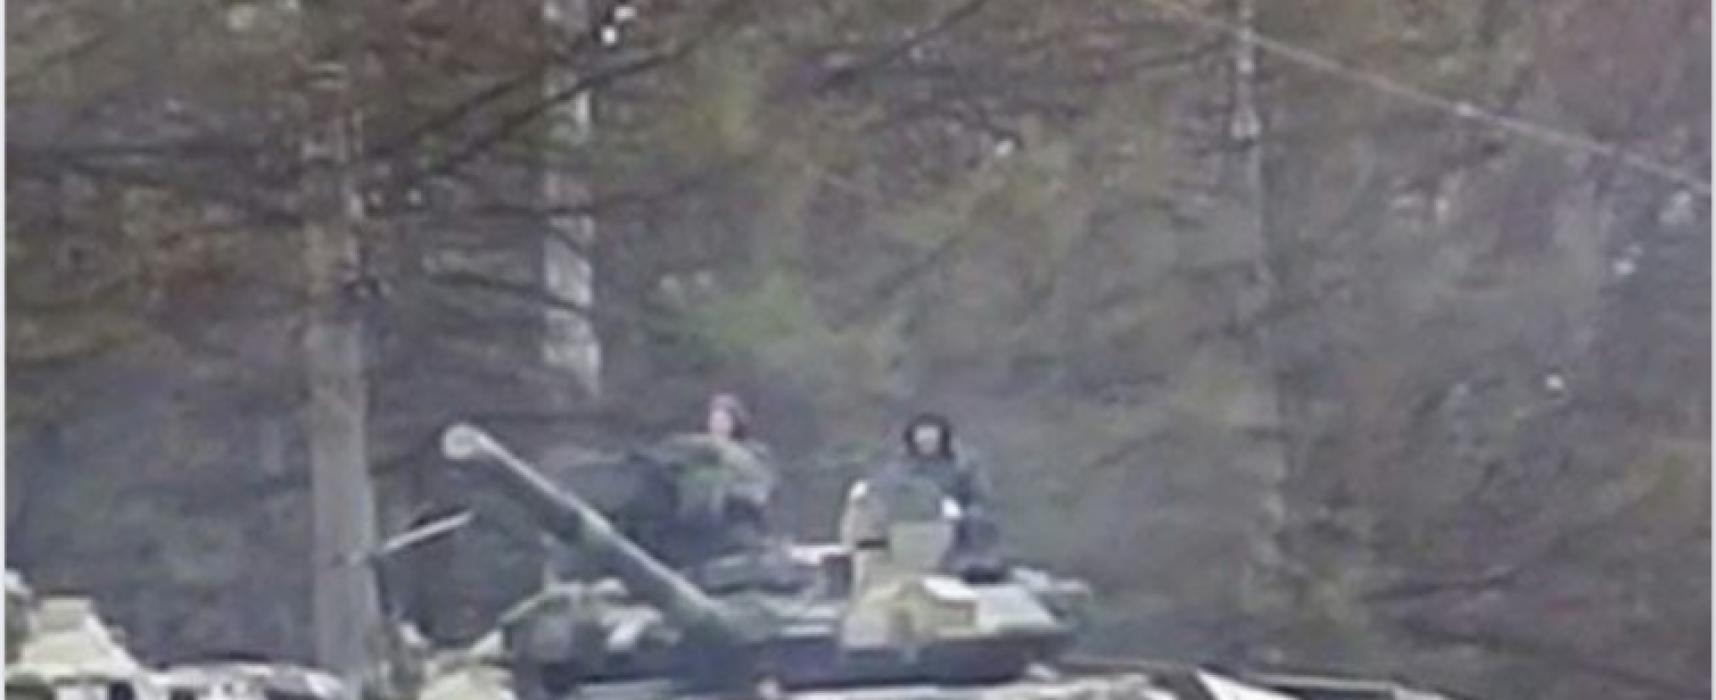 Fake: Russian Tanks in Smolensk Heading Towards Belarus Border